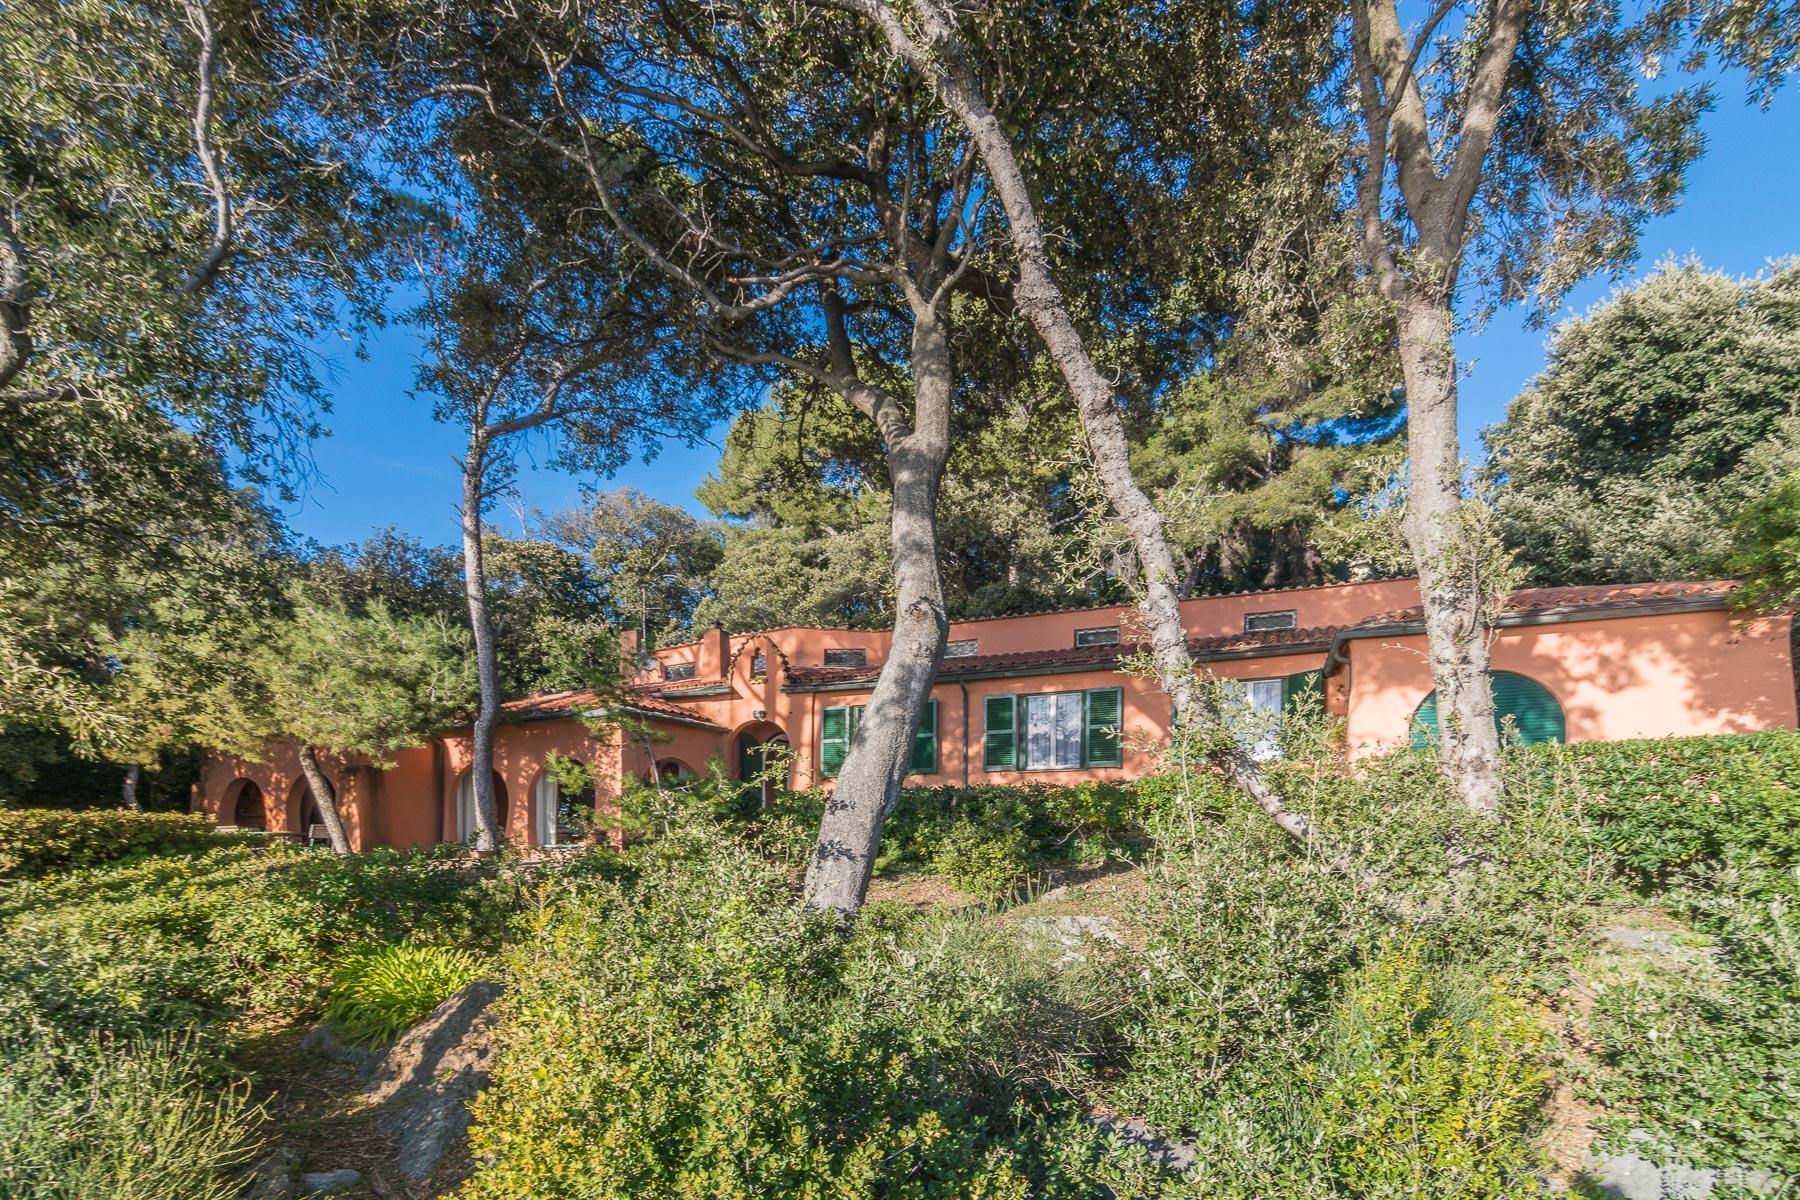 Villa in Vendita a Lerici: 5 locali, 330 mq - Foto 4